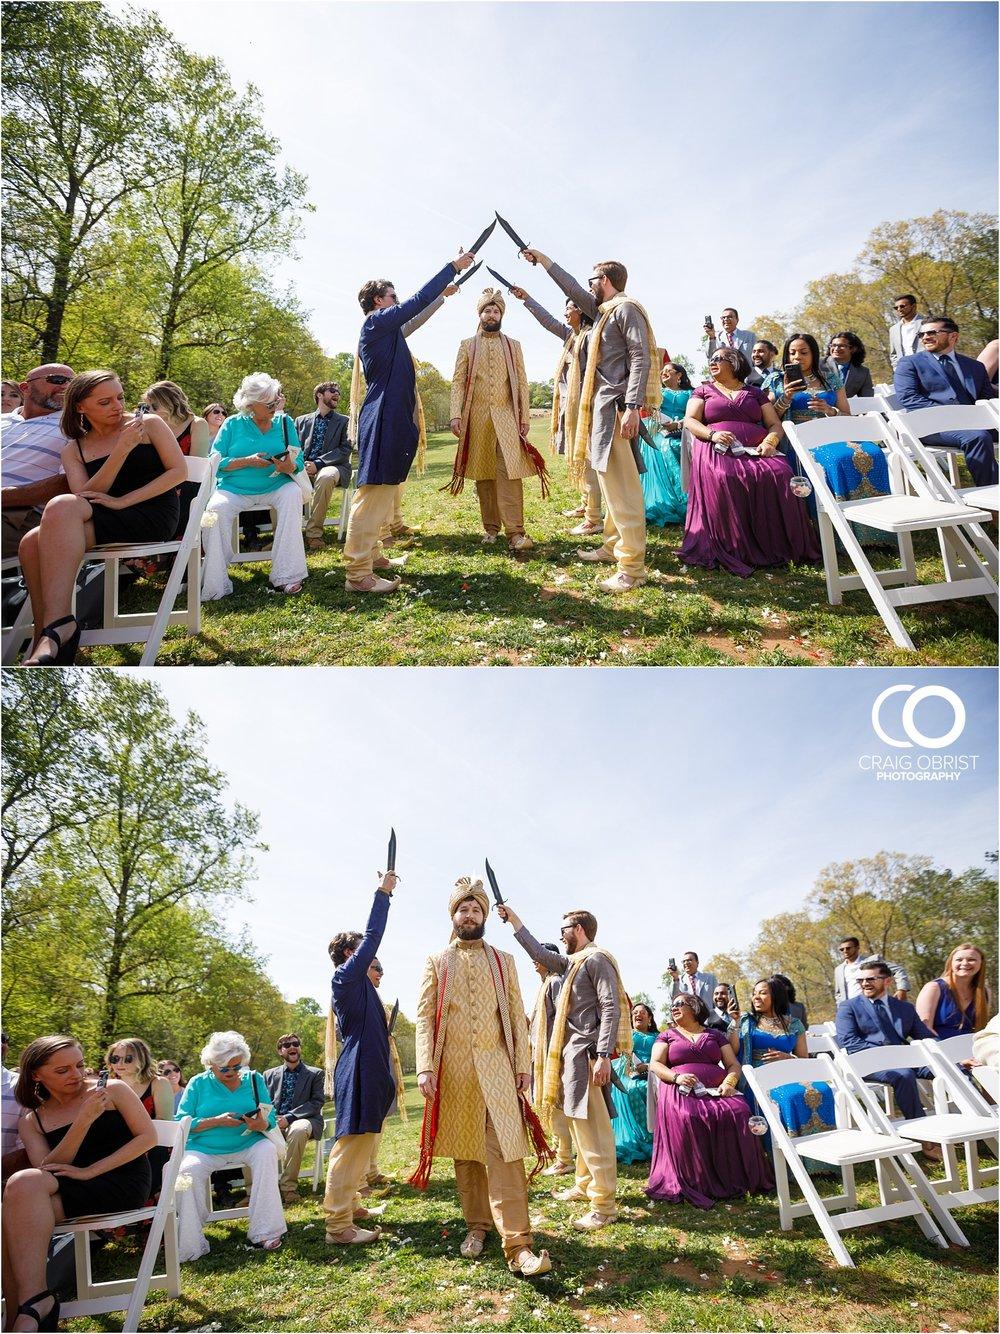 Chukkar Farm Polo Club Events & Weddings Craig Obrist_0071.jpg